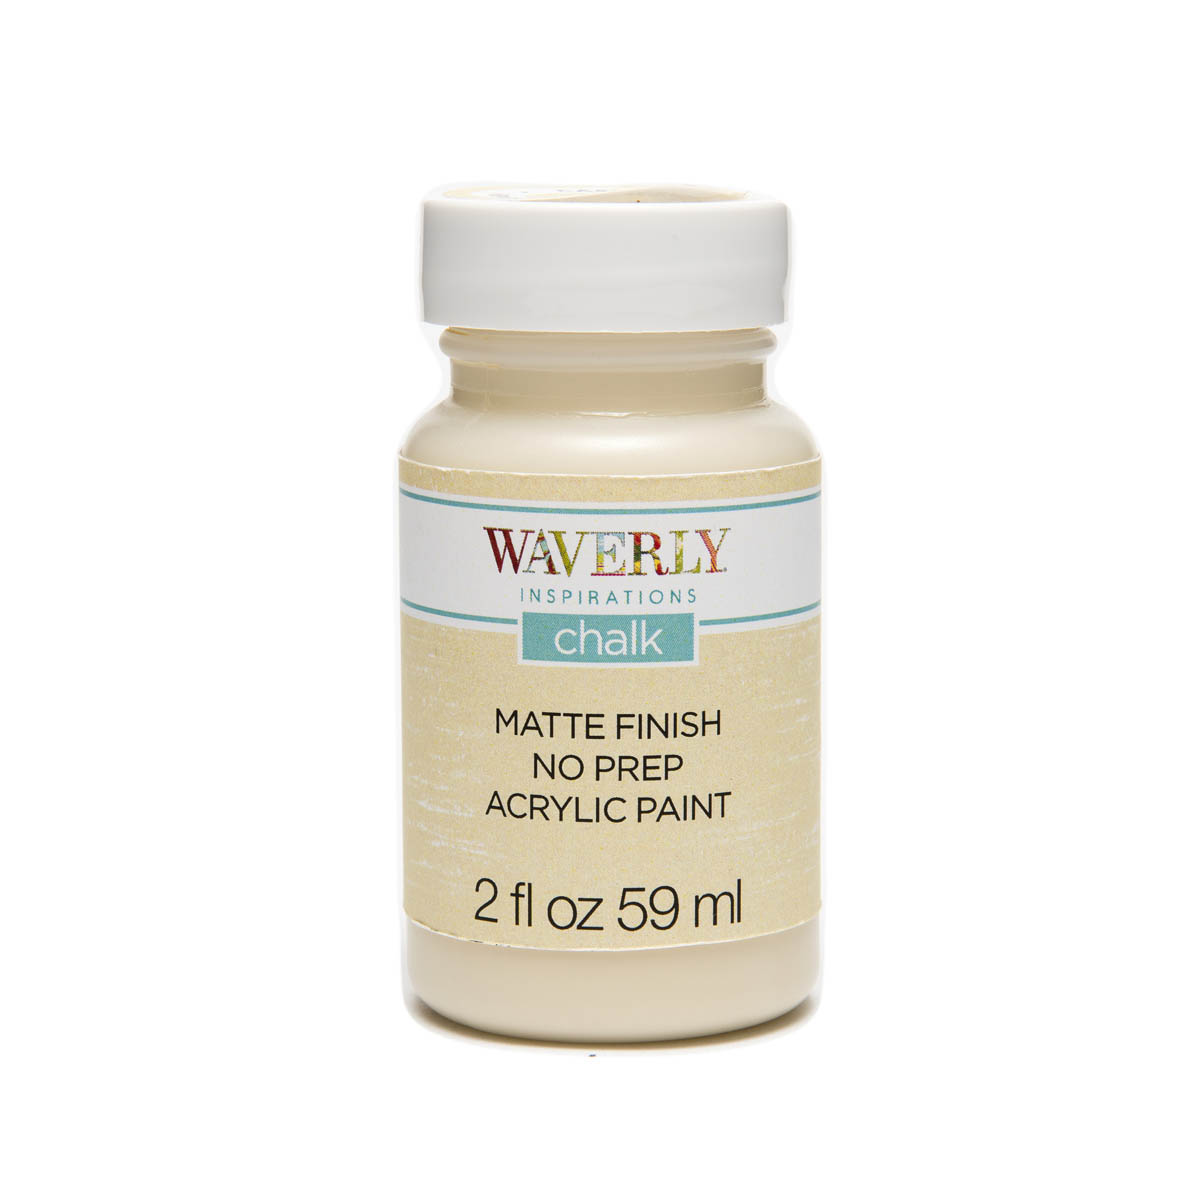 Waverly ® Inspirations Chalk Finish Acrylic Paint - Cashew, 2 oz. - 60739E